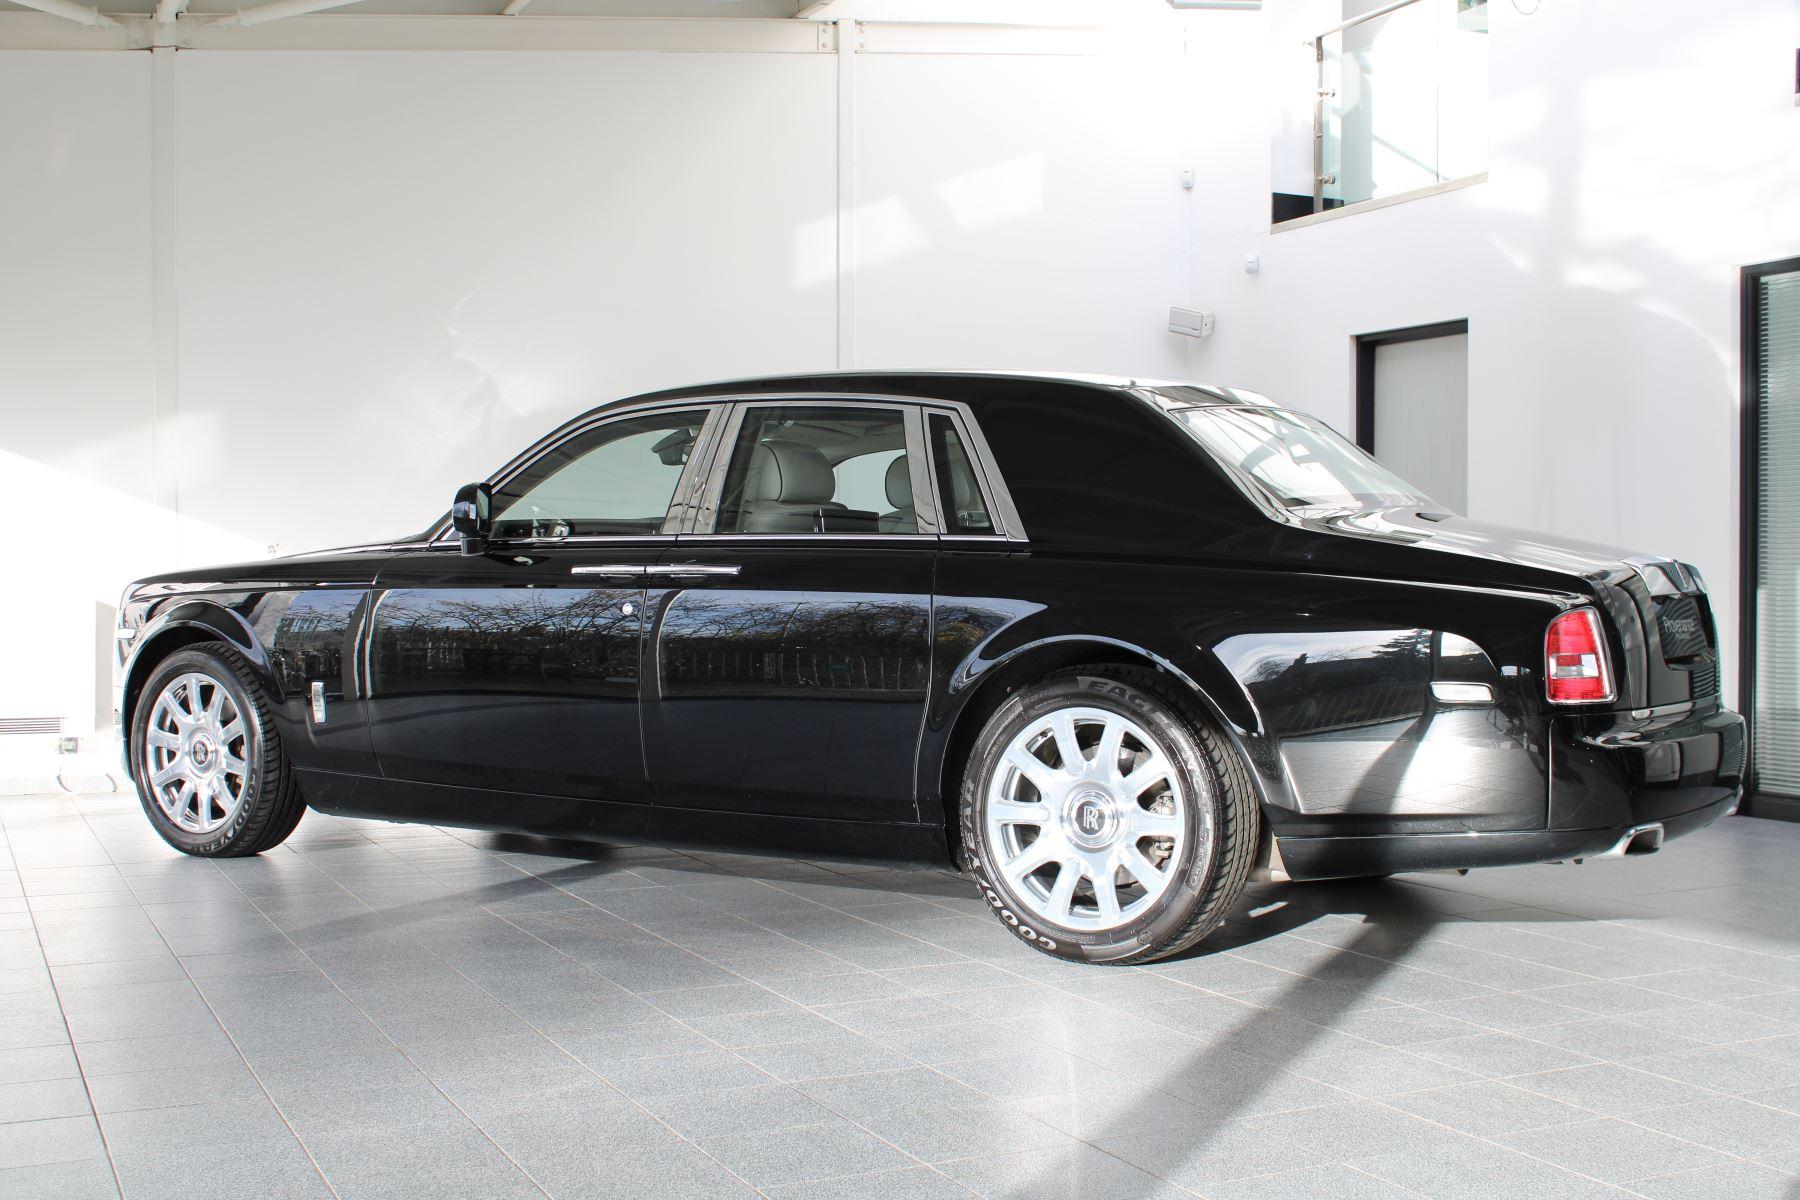 Rolls-Royce Phantom II 4dr Auto image 8